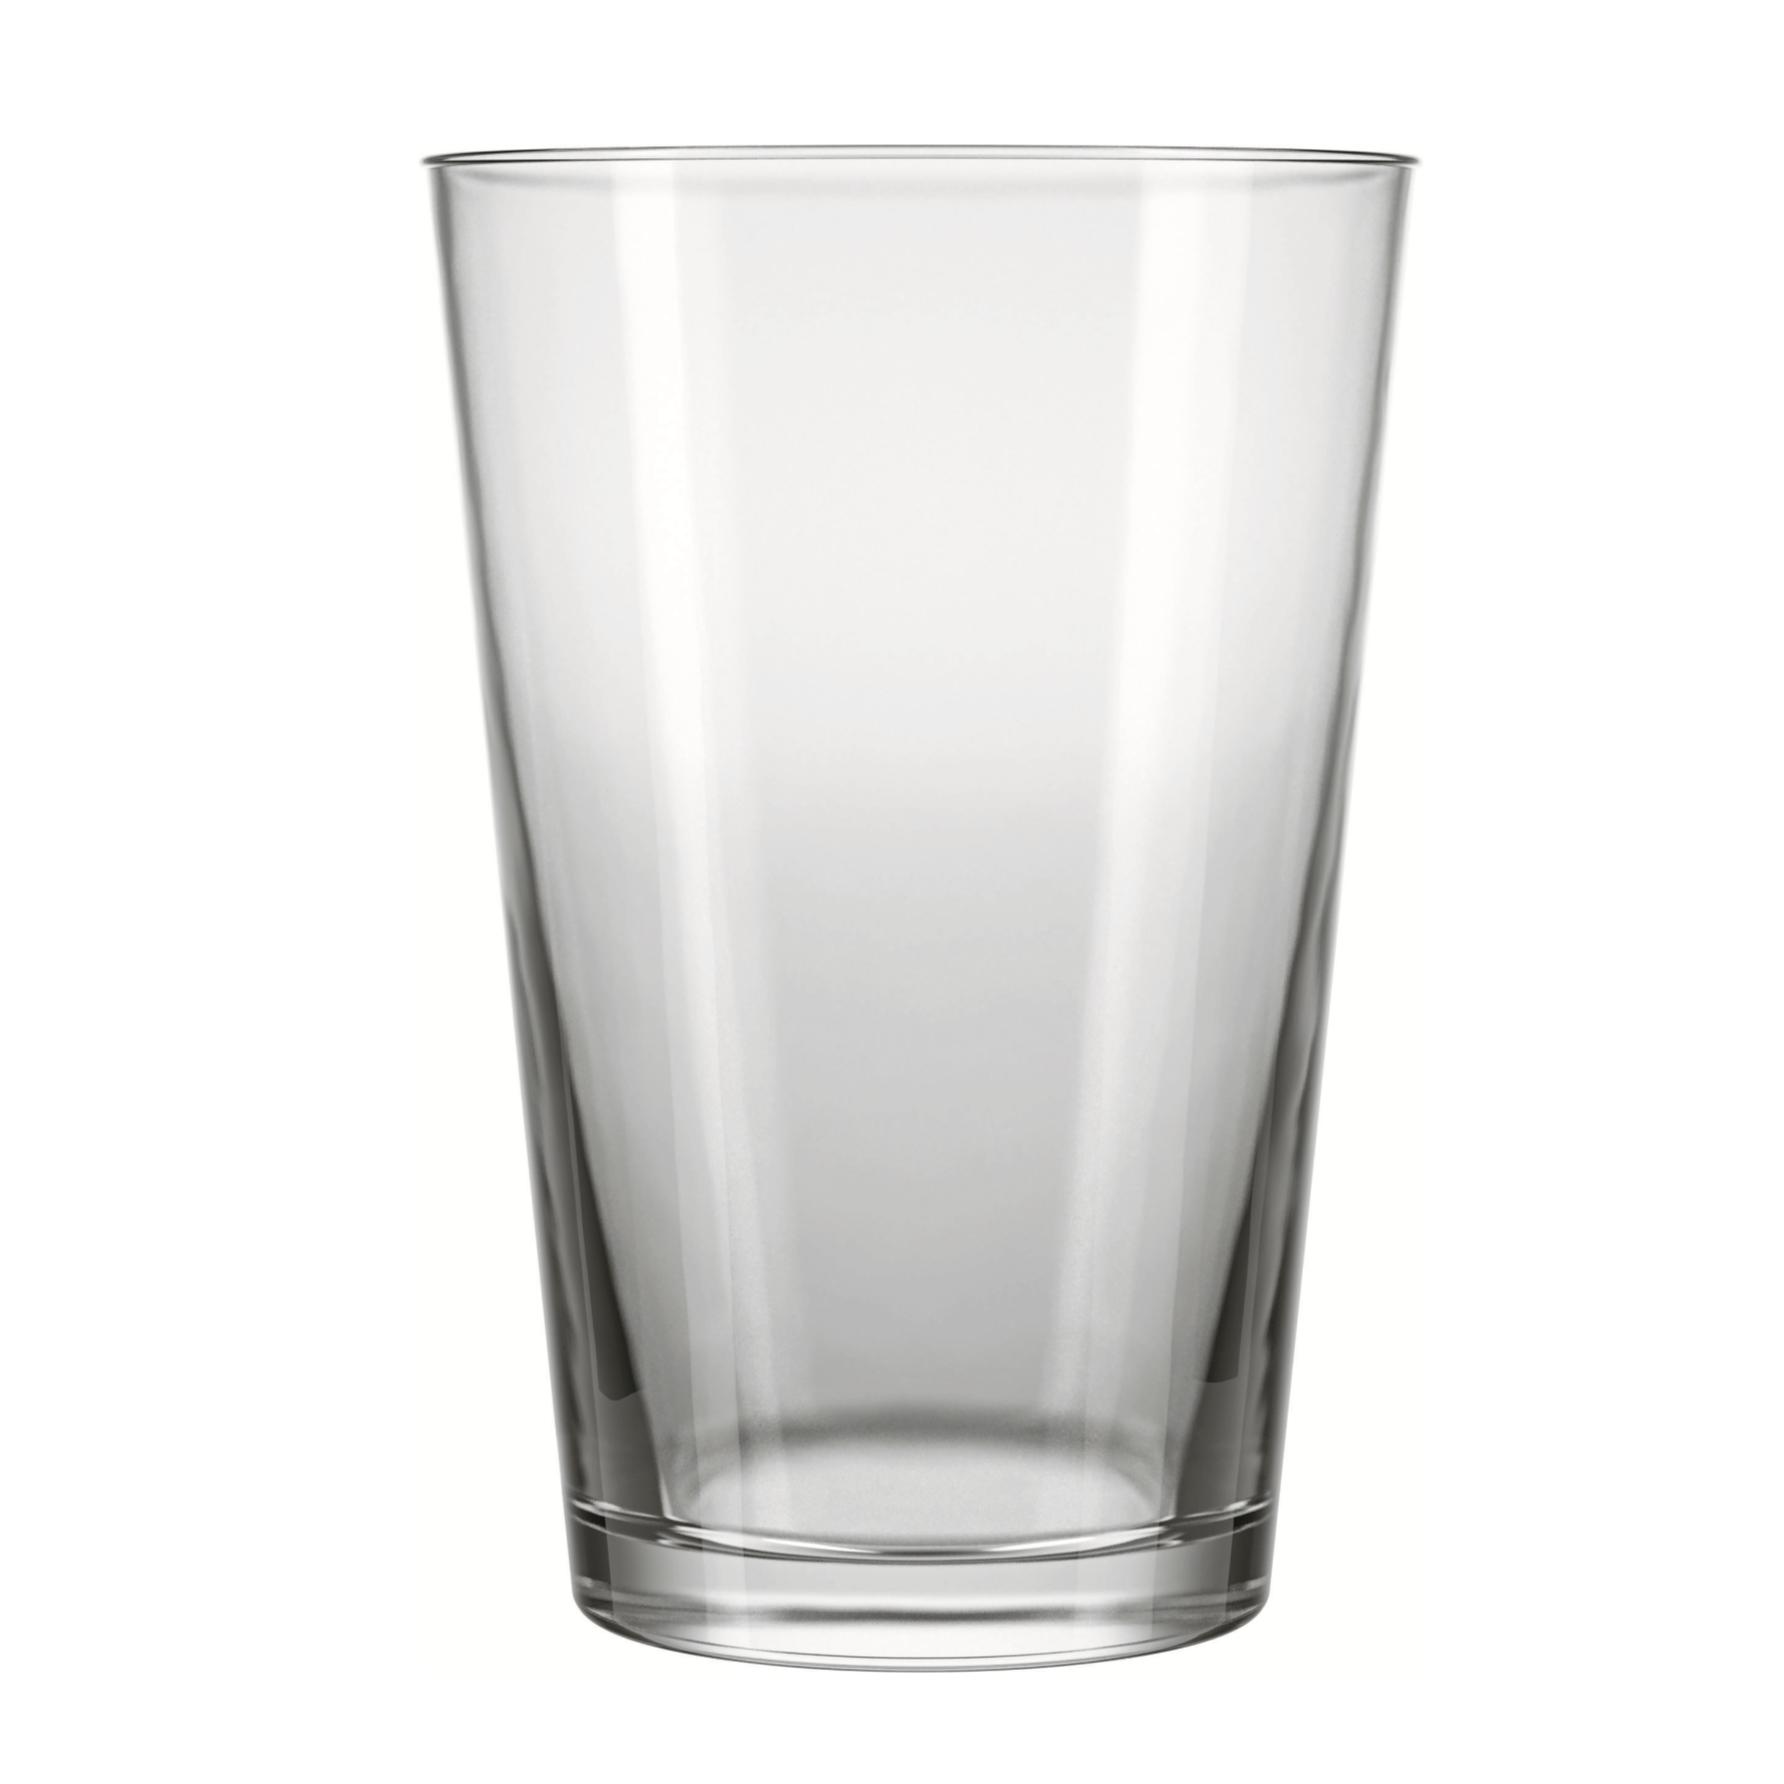 Copo Long Drink de Vidro 350ml Transparente - Caldereta Nadir